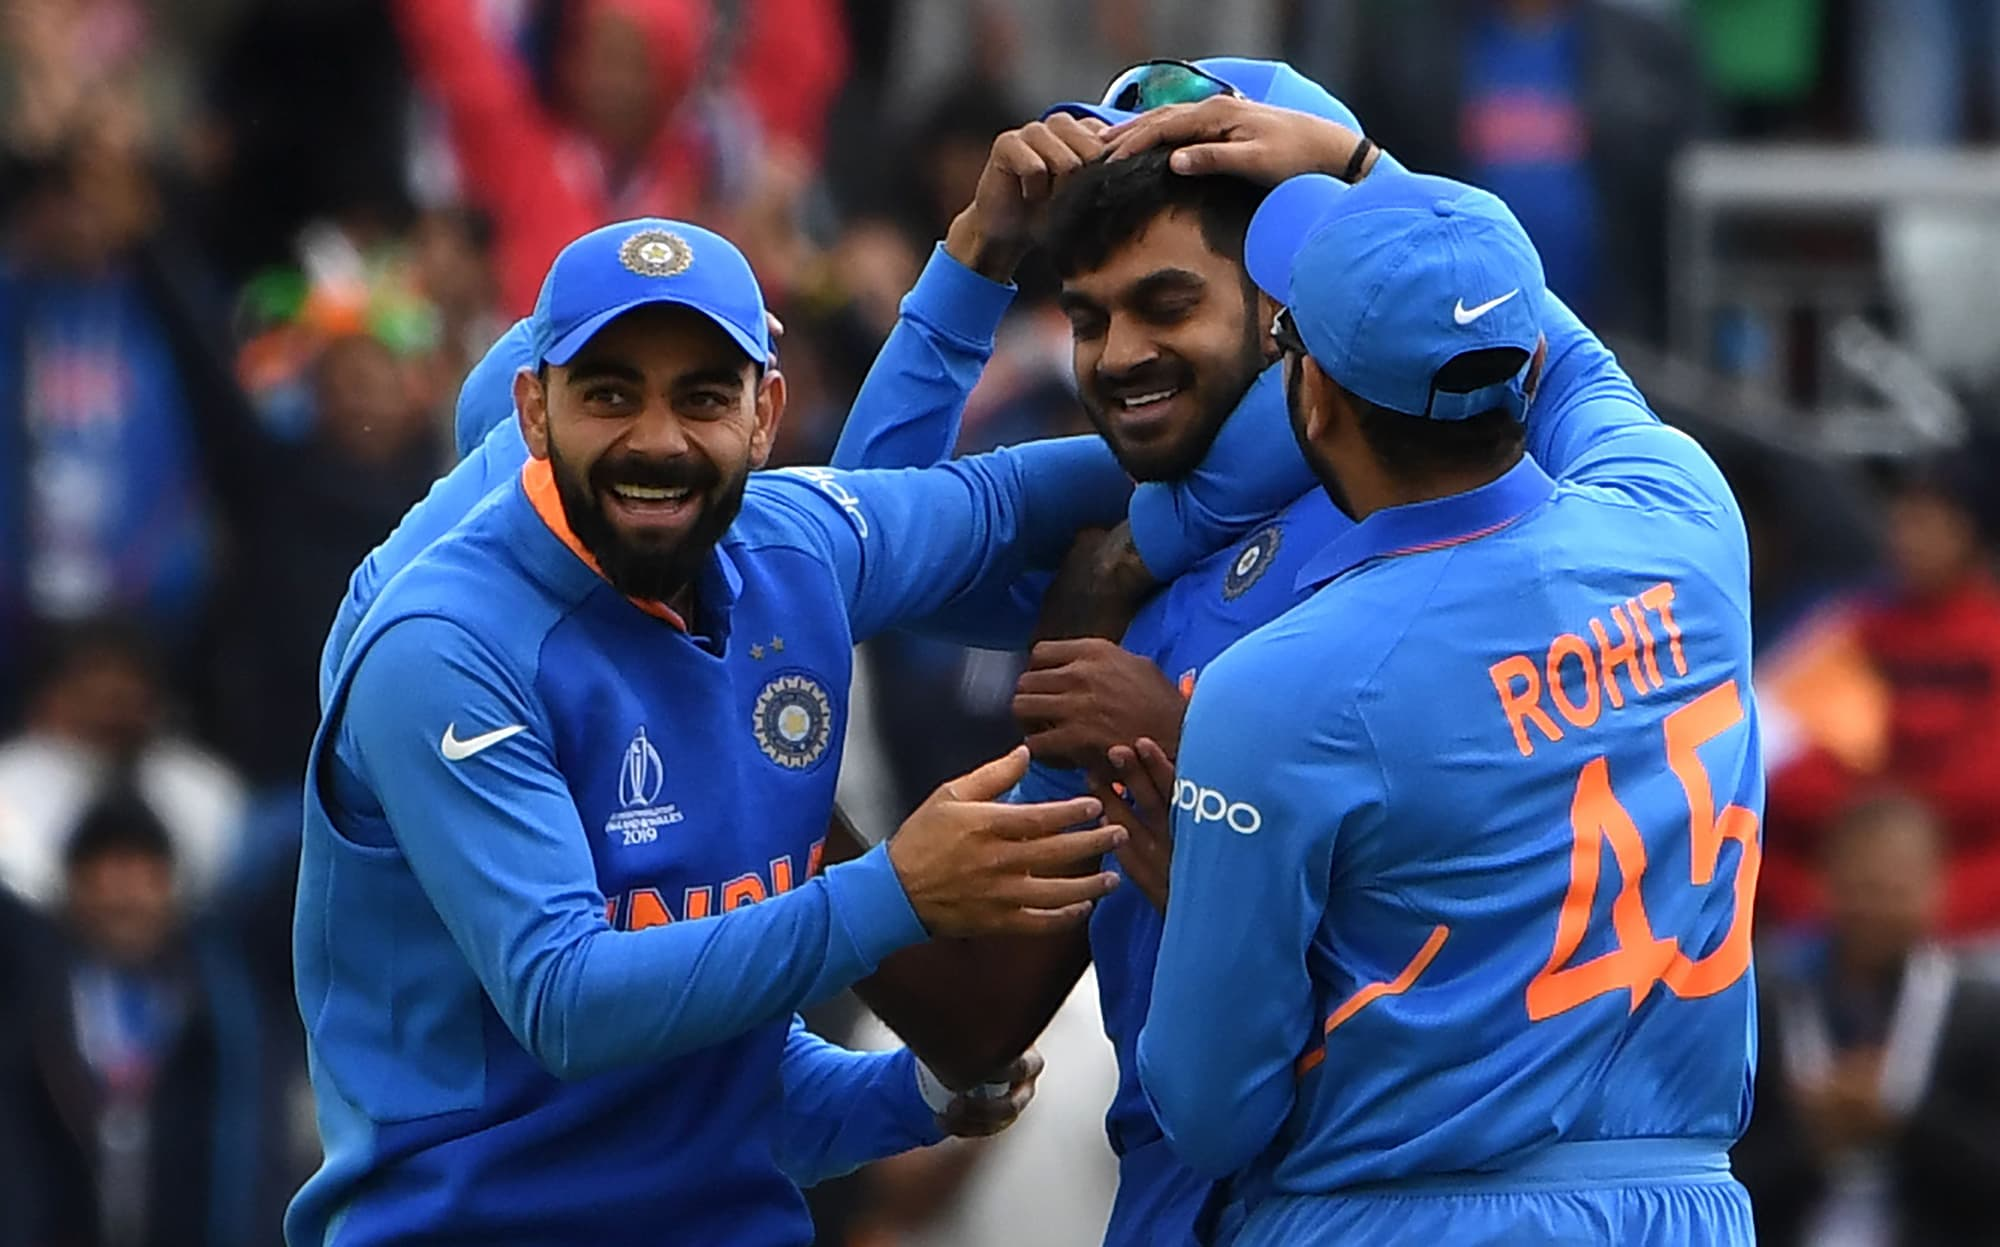 Vijay Shankar (C) celebrates with India's captain Virat Kohli (L) and teammates after the dismissal of Imamul Haq. ─ AFP